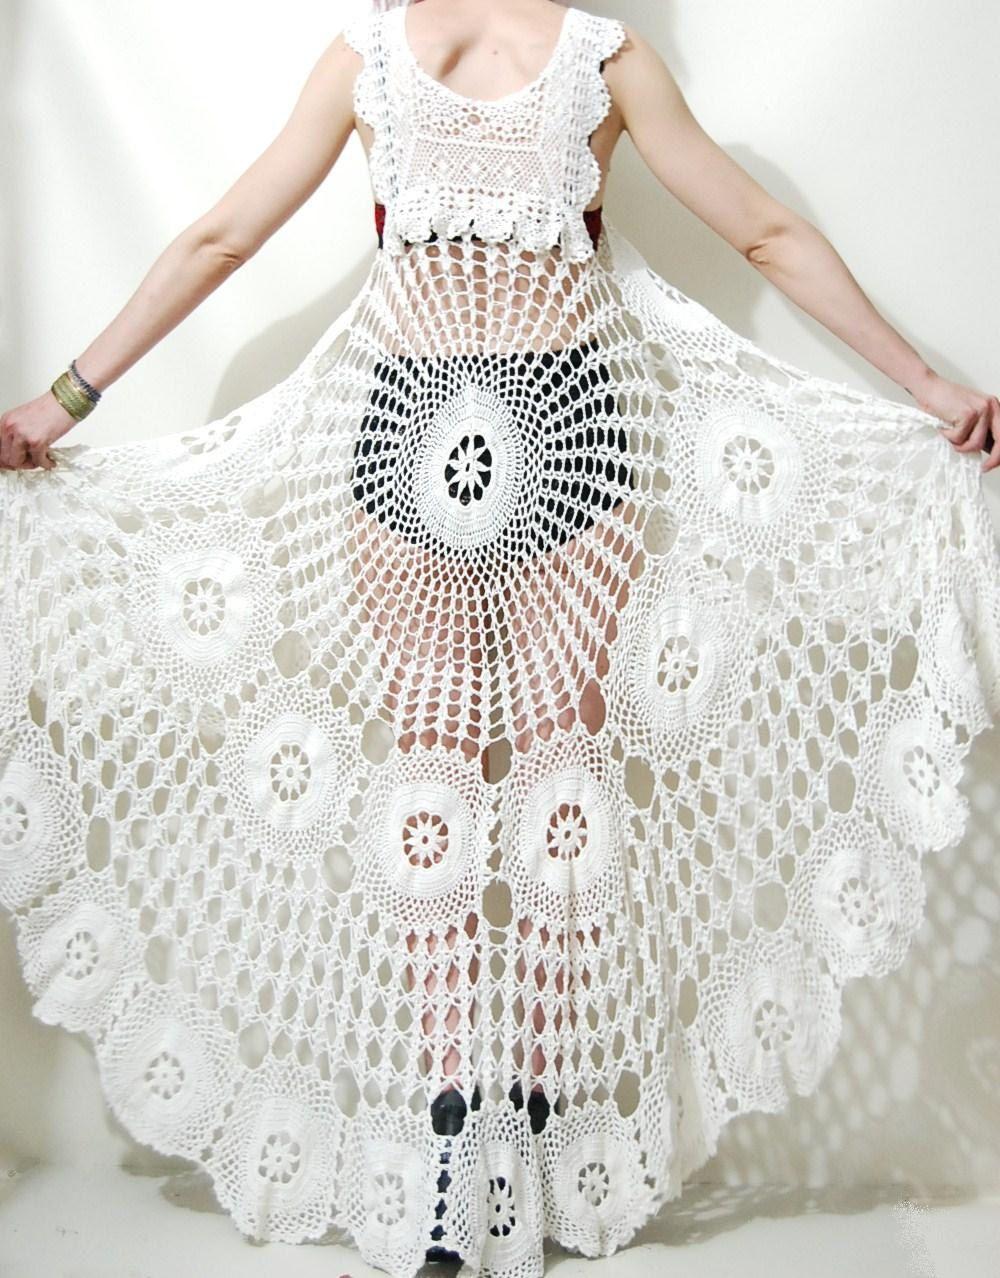 crochet dress | crochet | Pinterest | Tejido, Vestiditos y Vestidos ...